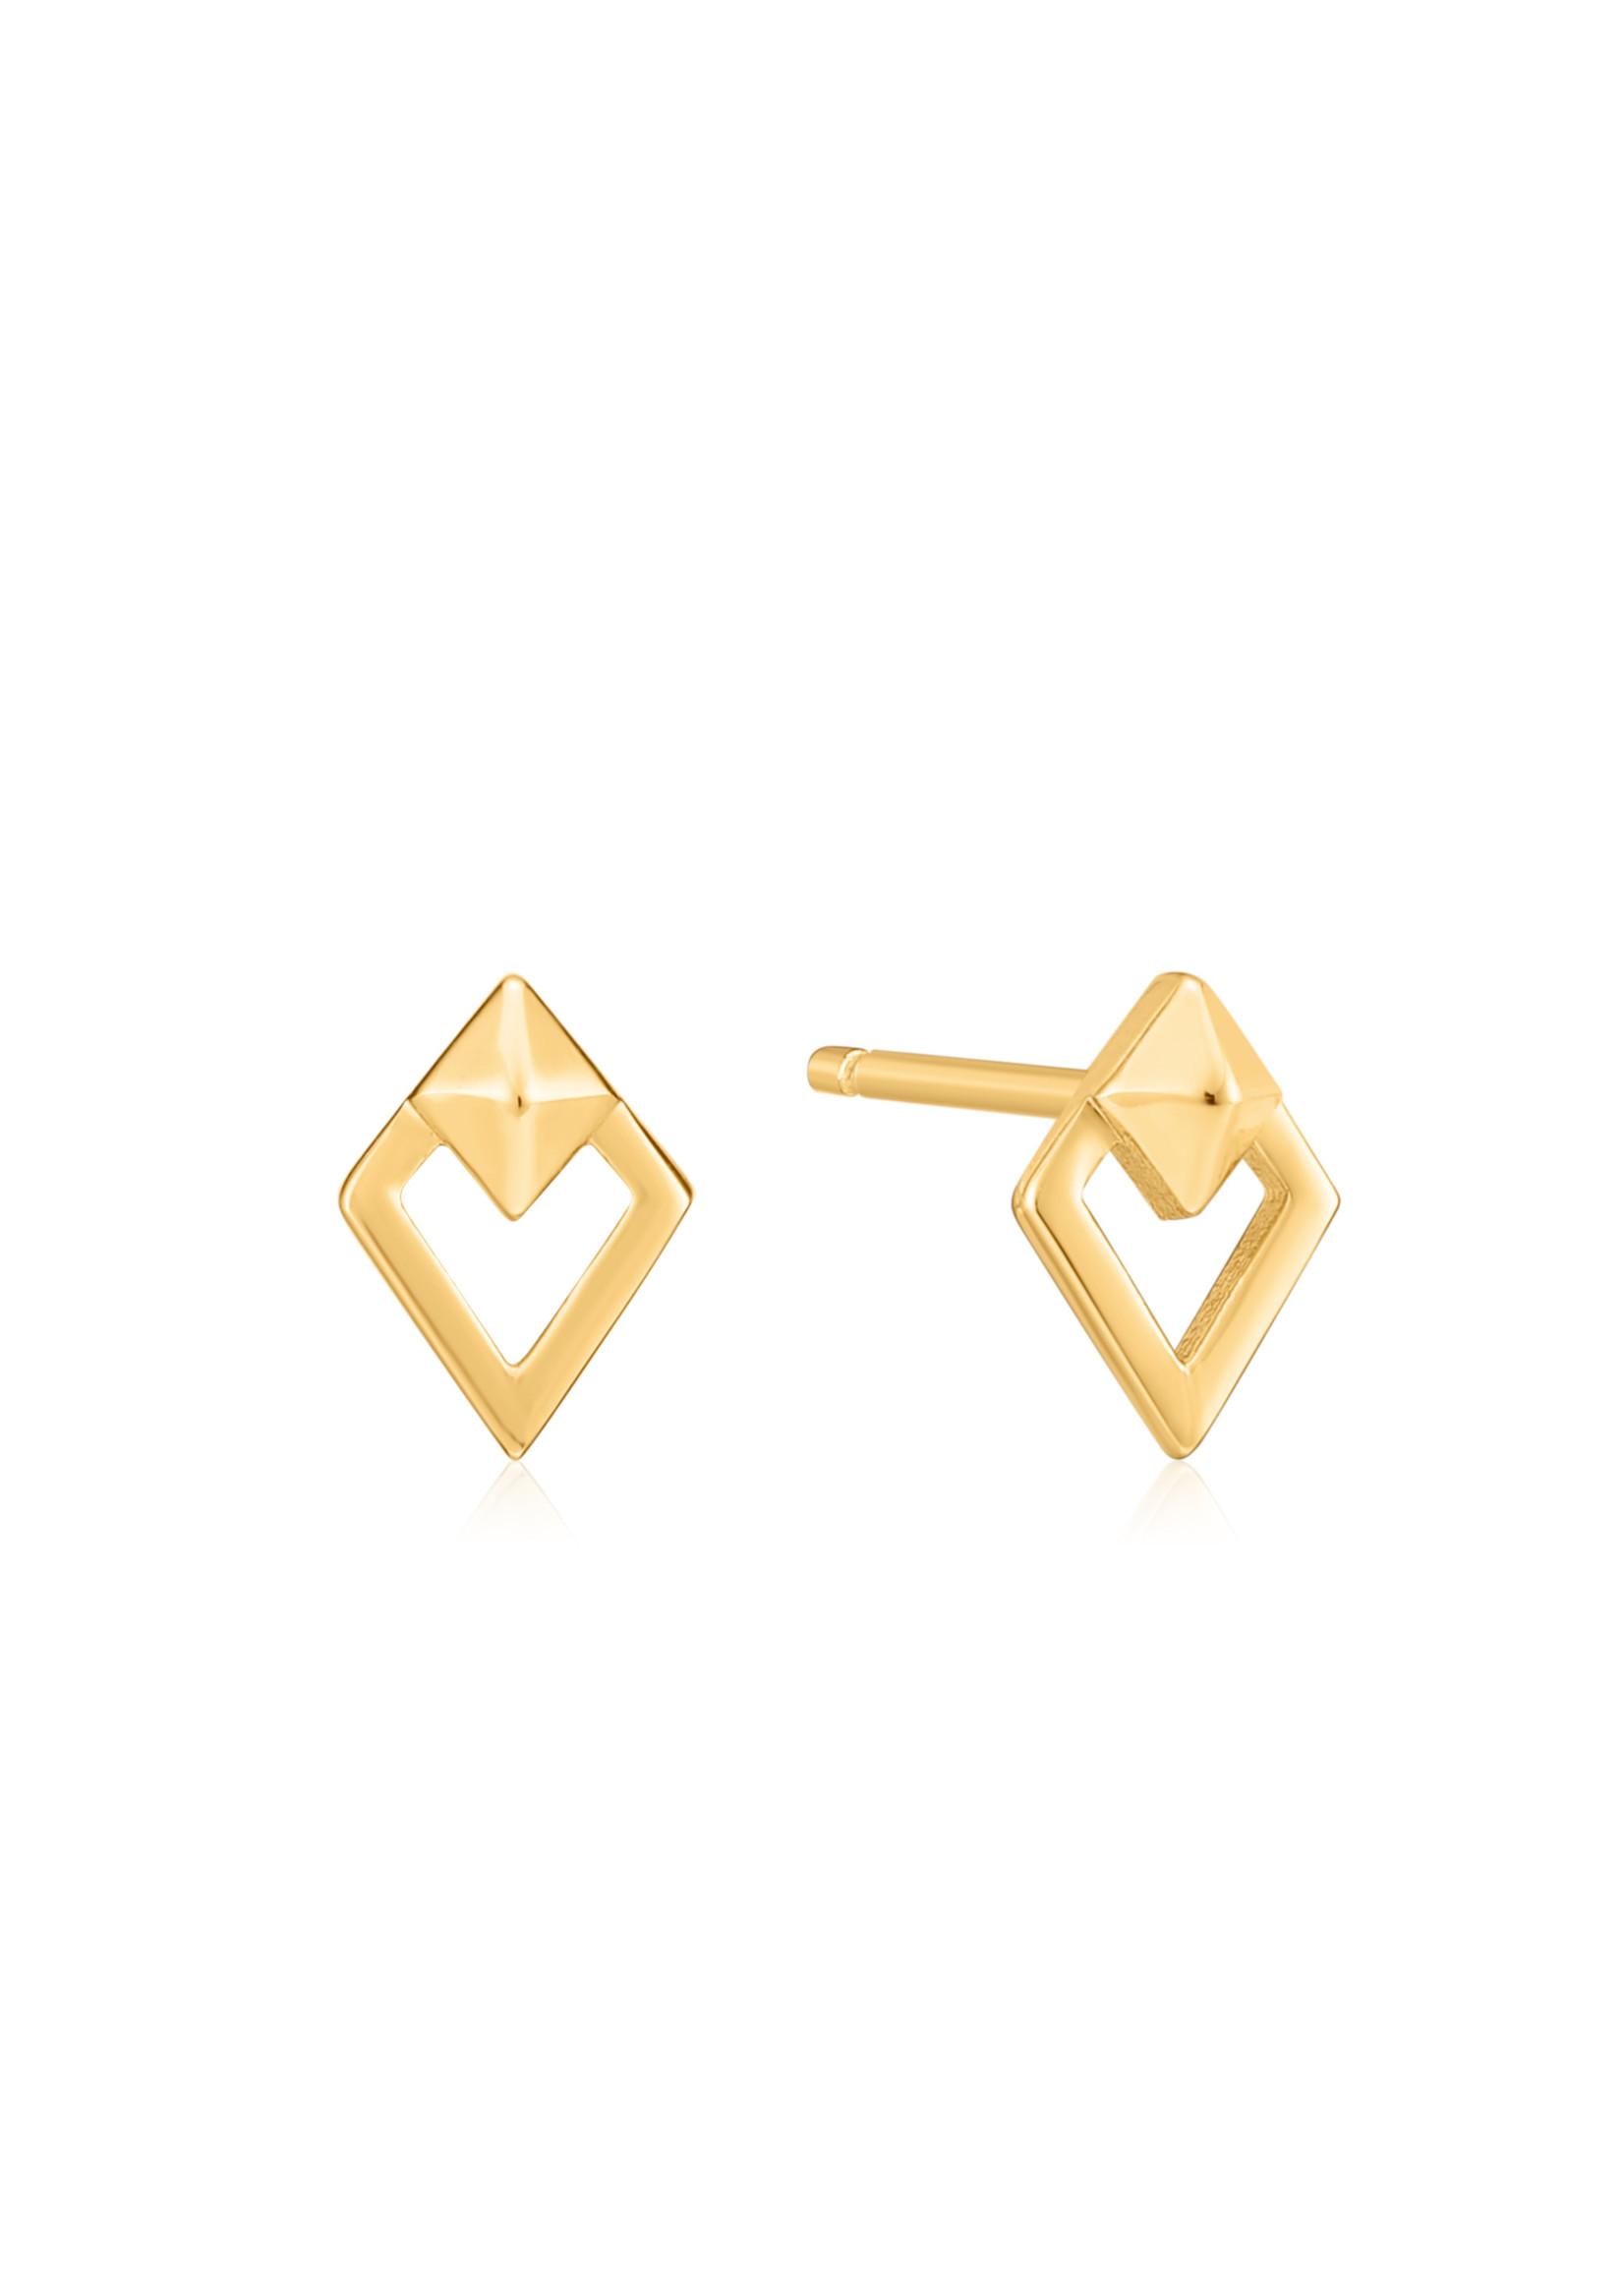 Ania Haie GOLD SPIKE DIAMOND STUD EARRINGS